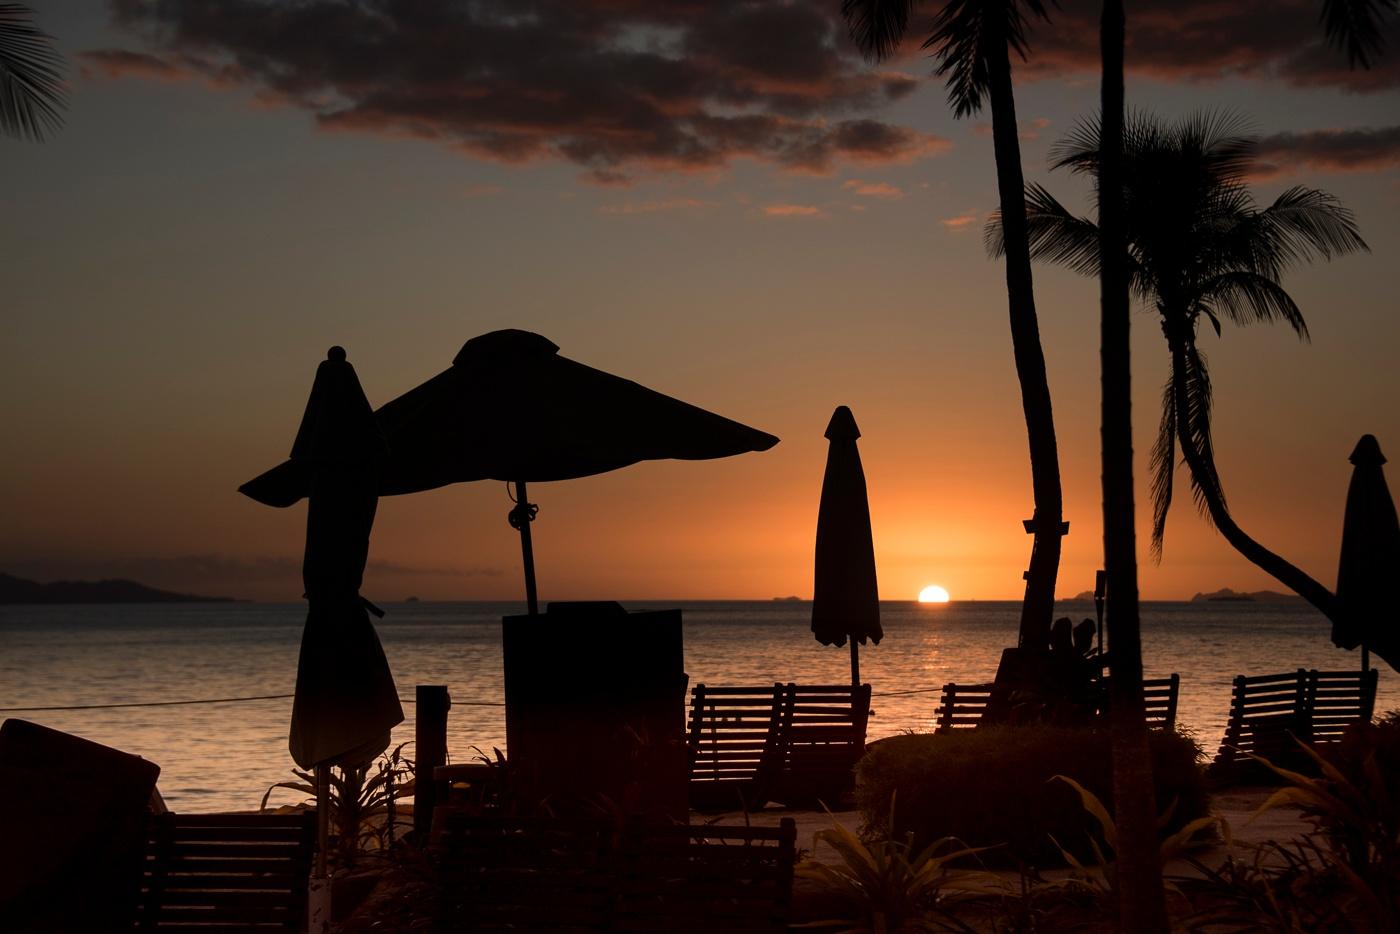 Sun setting over the Fiji Islands by Trevor McKinnon